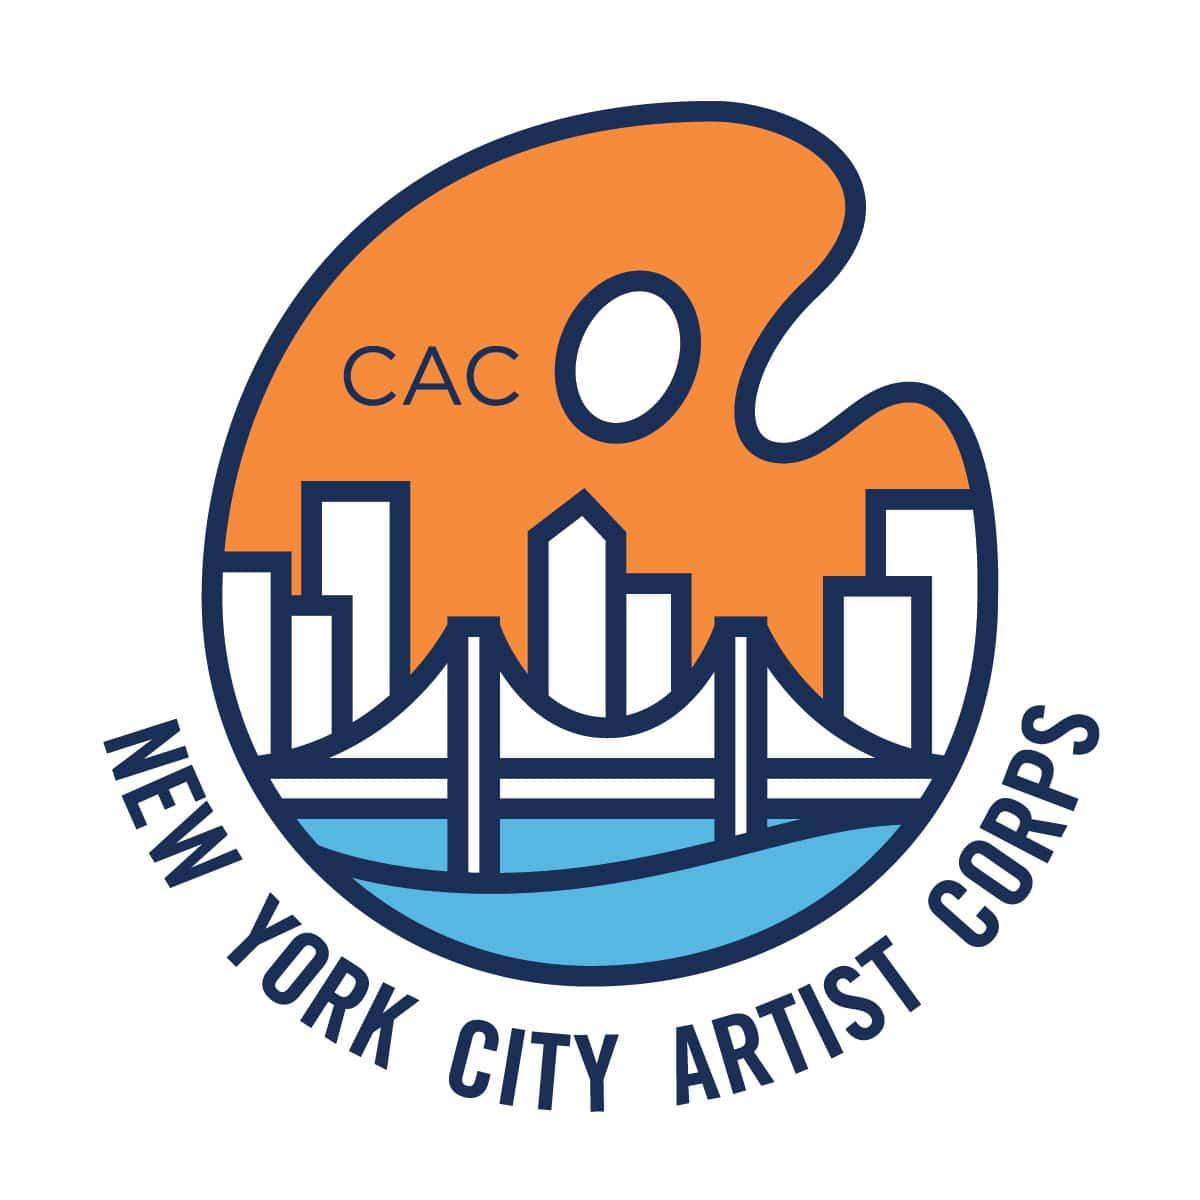 New York City Artist Corps logo